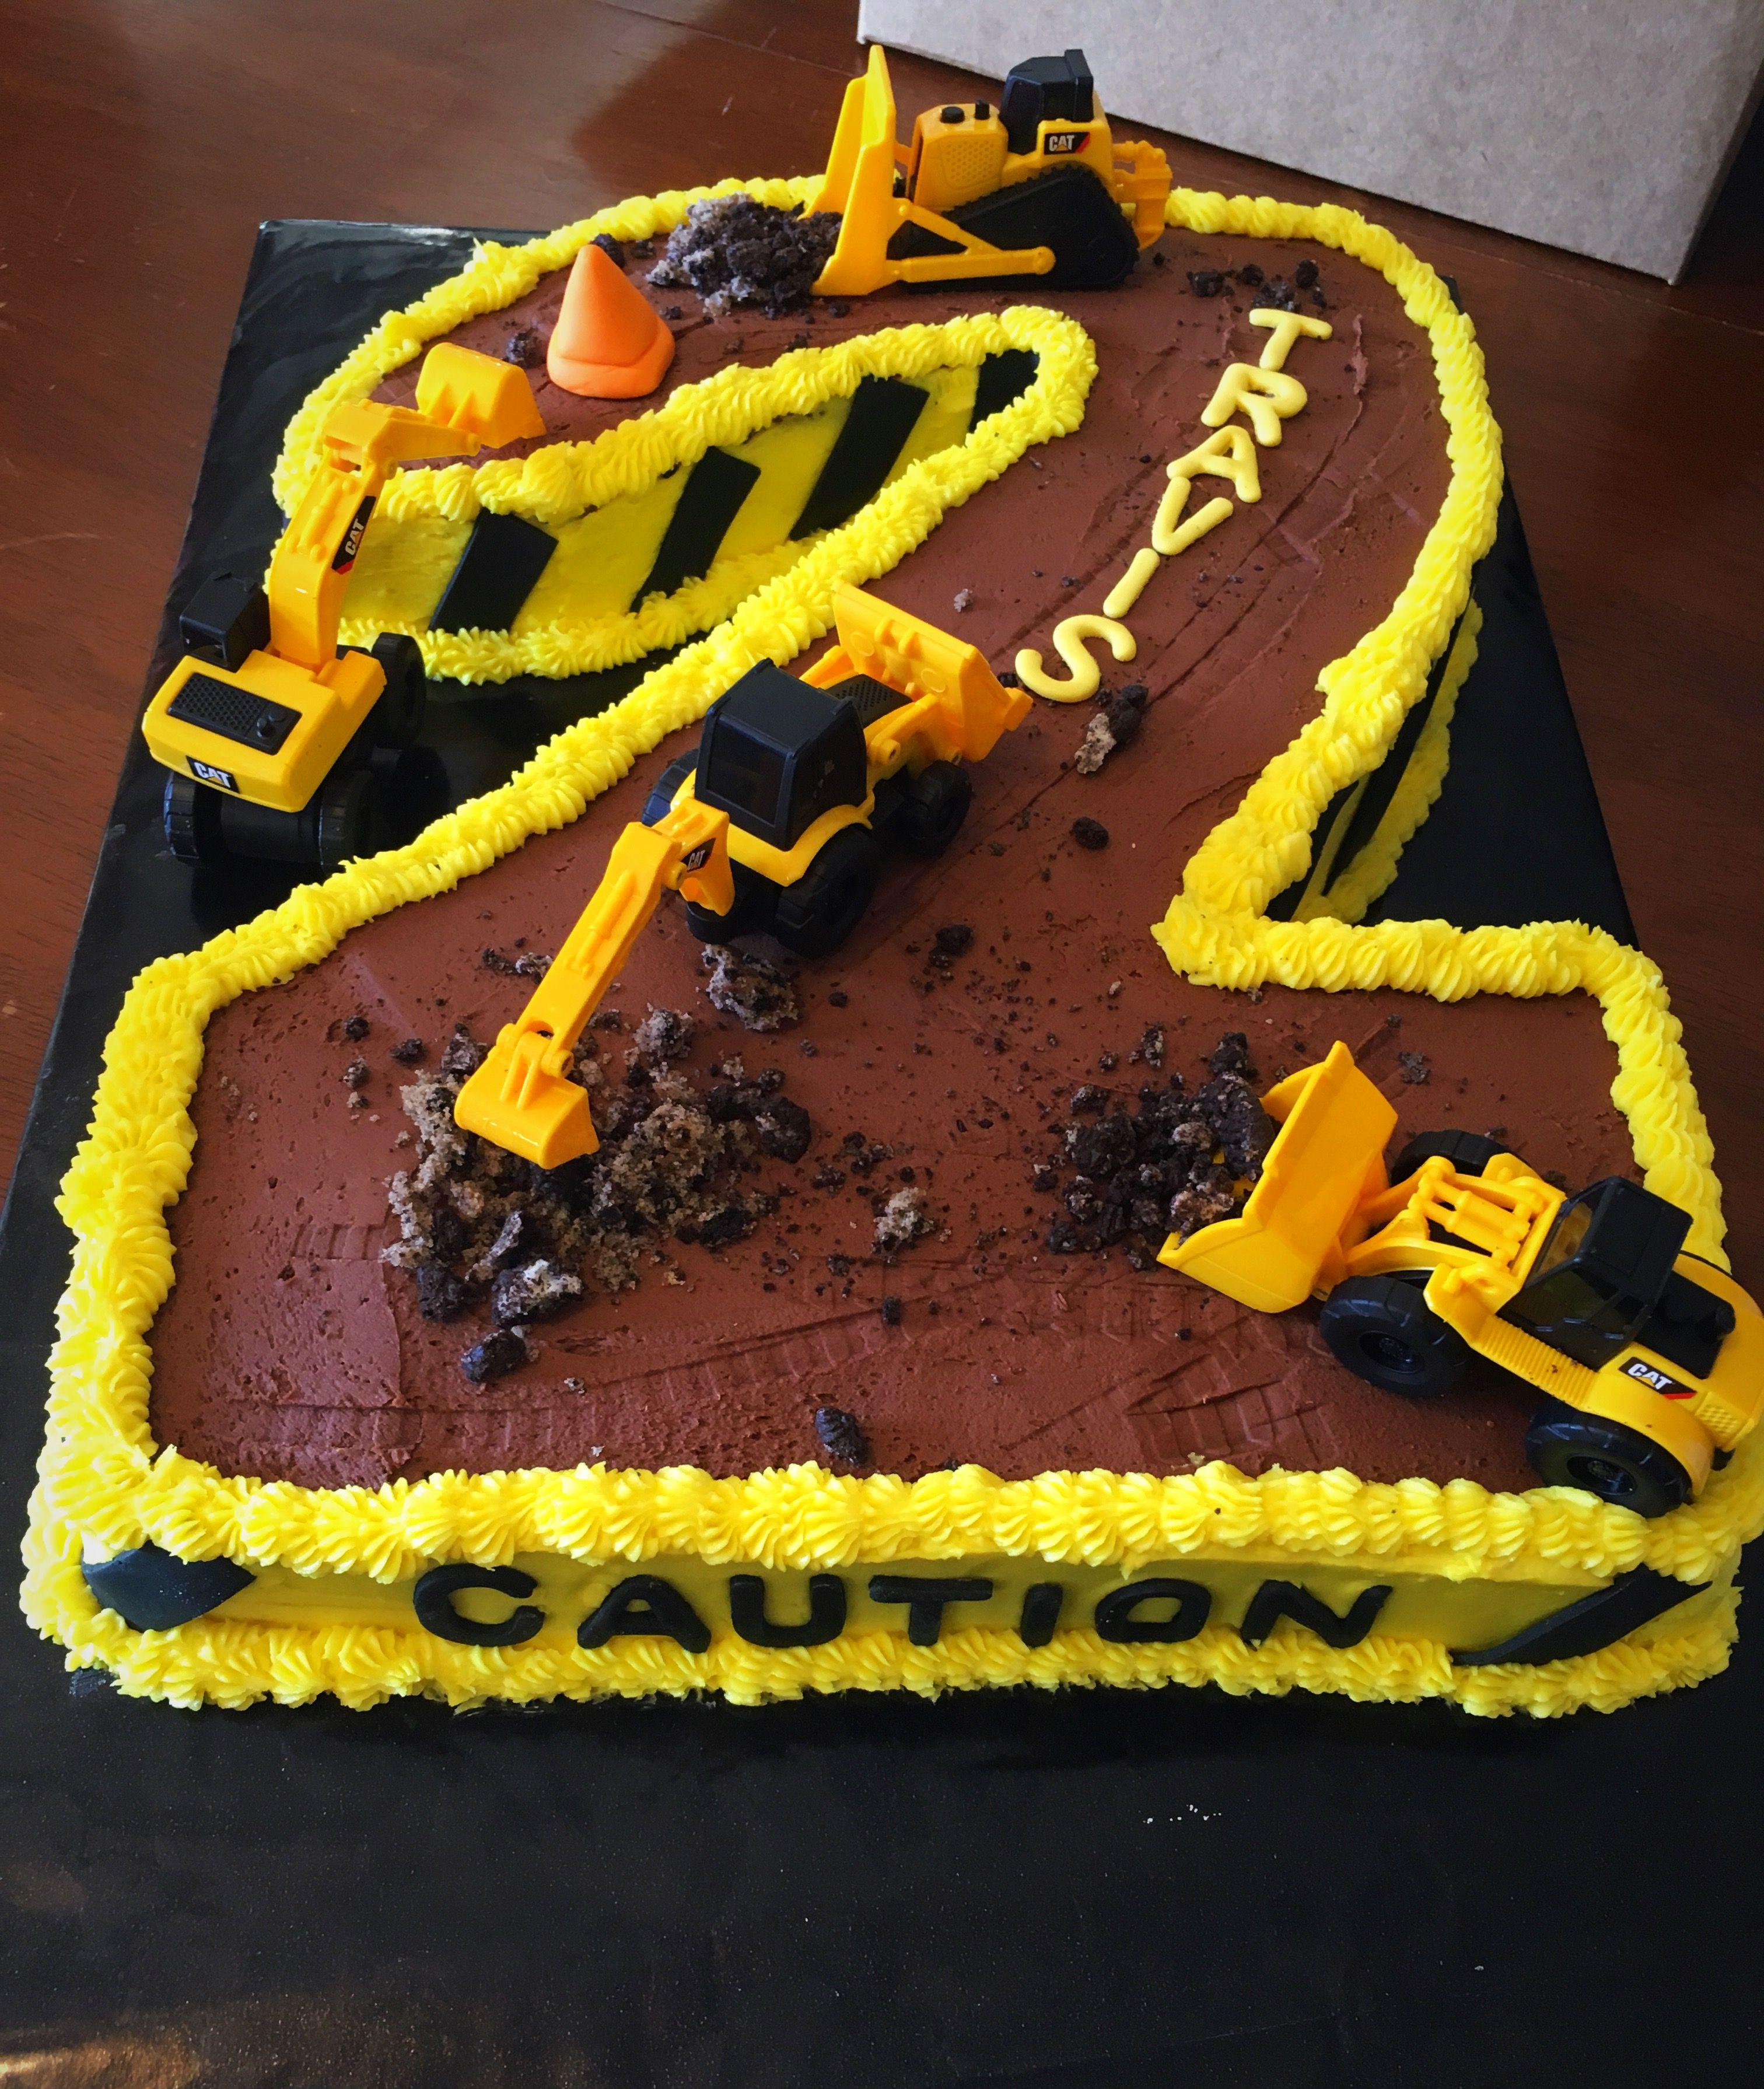 Construction 2 cake cake desserts food